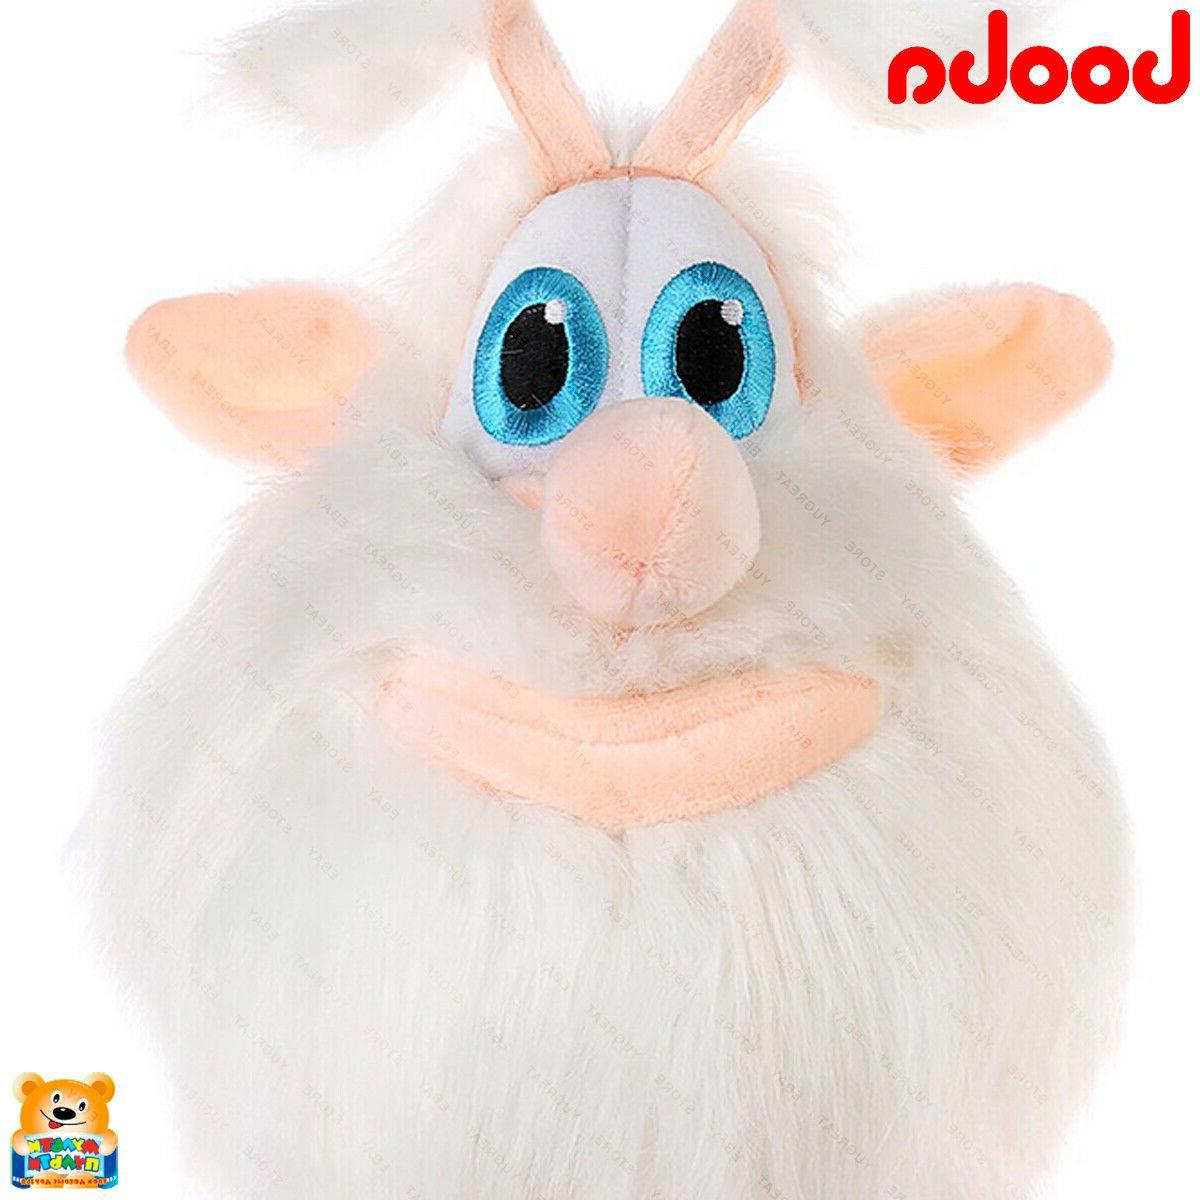 MULTI Buba, Plush, Toy, Cartoon Character